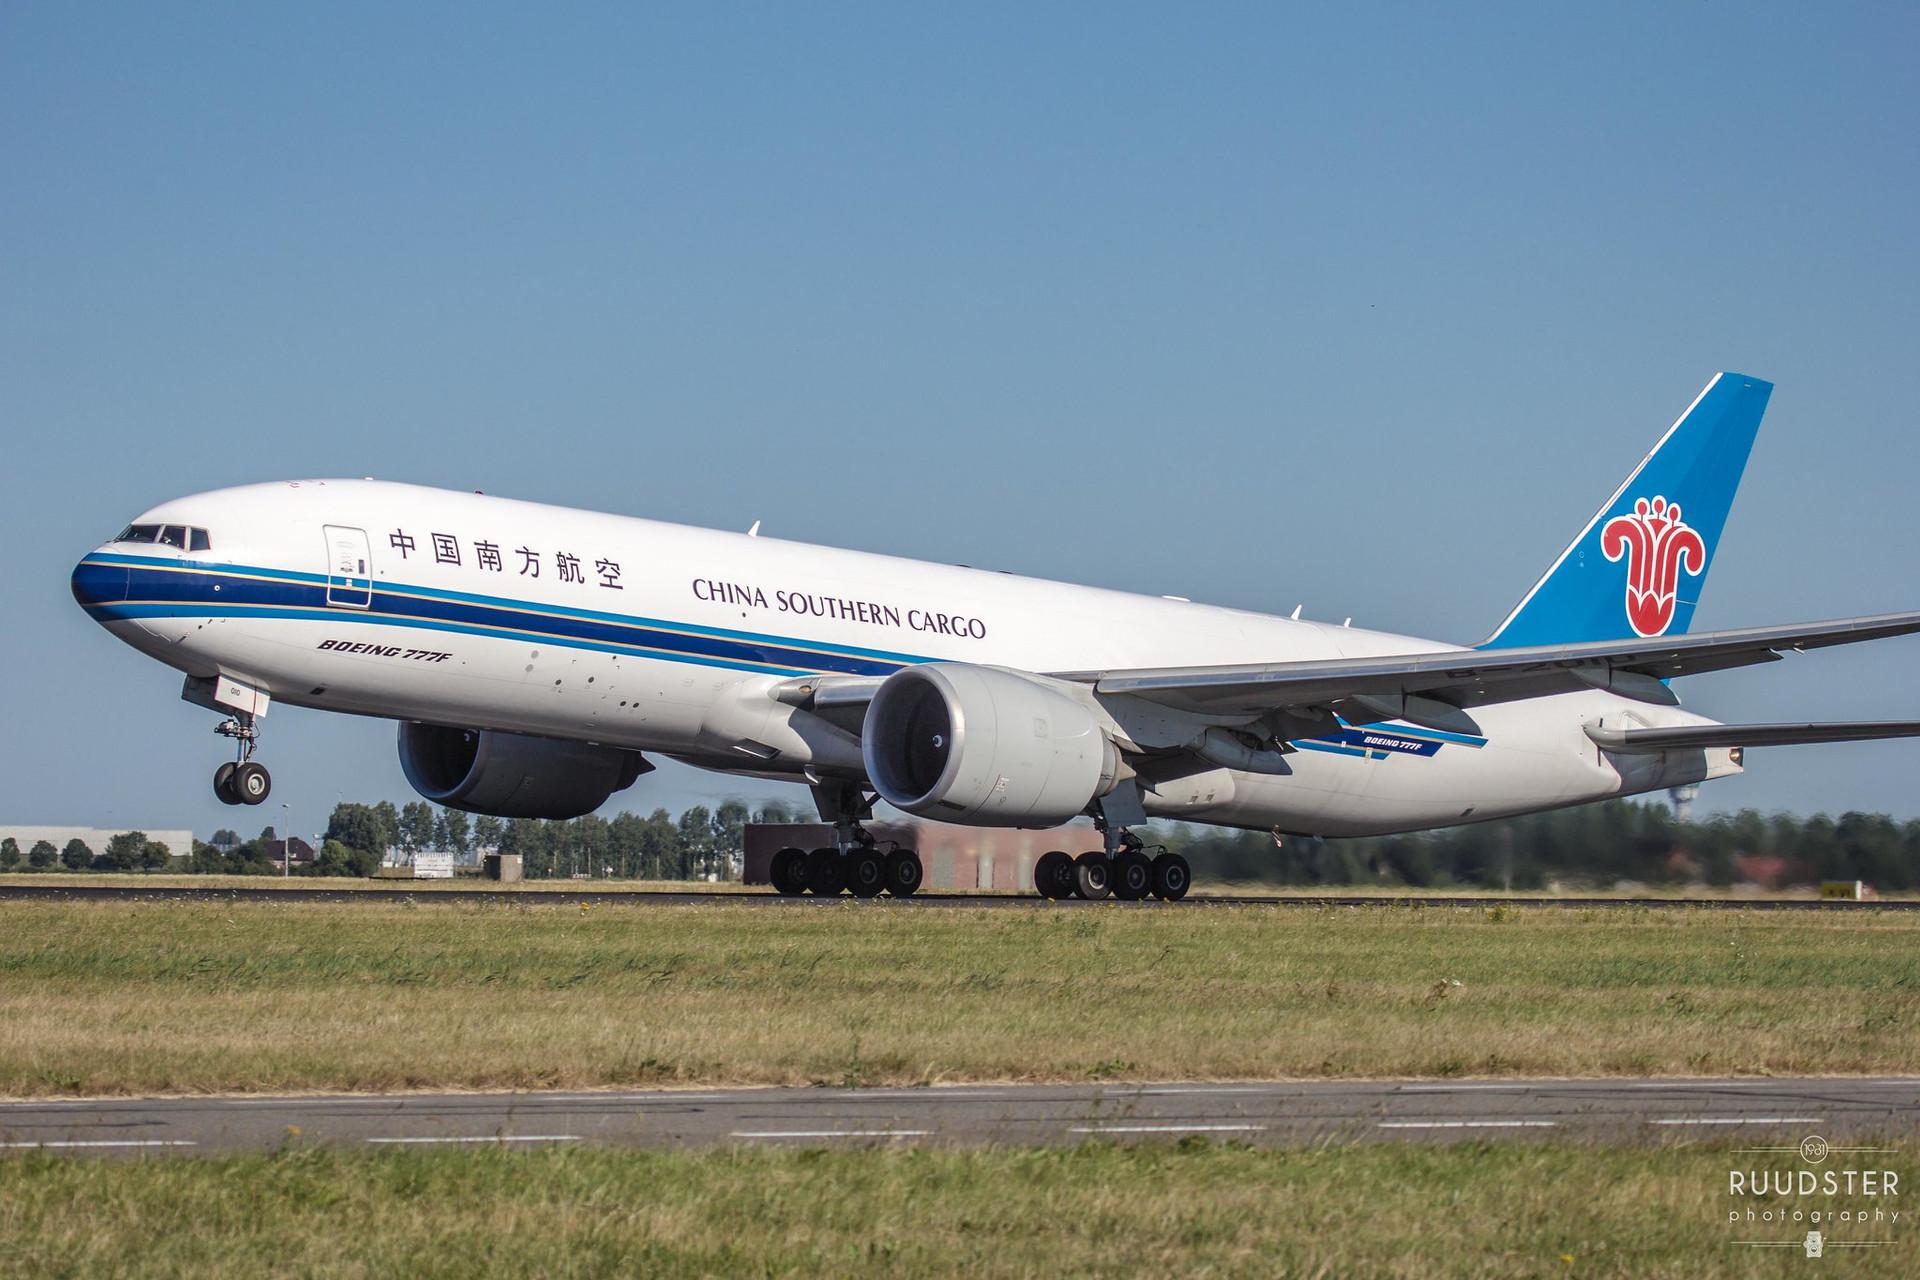 B-2010 | Build: 2015 - Boeing 777-F1B